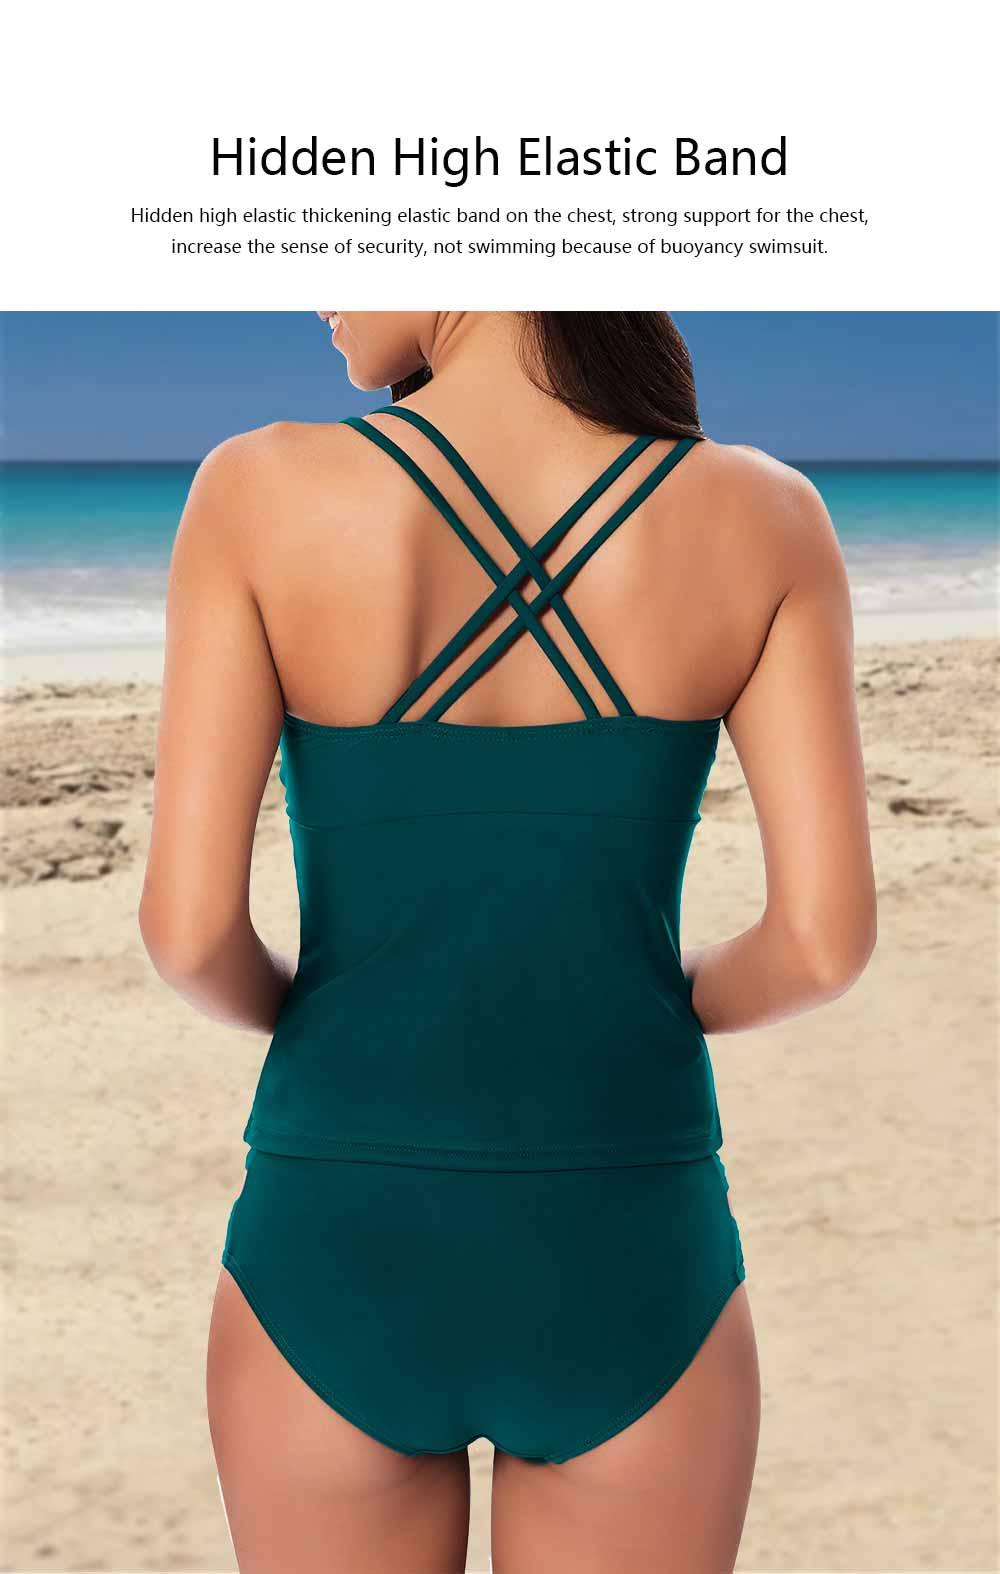 Women Cross Straps Bikini, Removeable Soft Cup Bikini, High Elastic Two Piece Swimming Suits for Ladies Girls 5